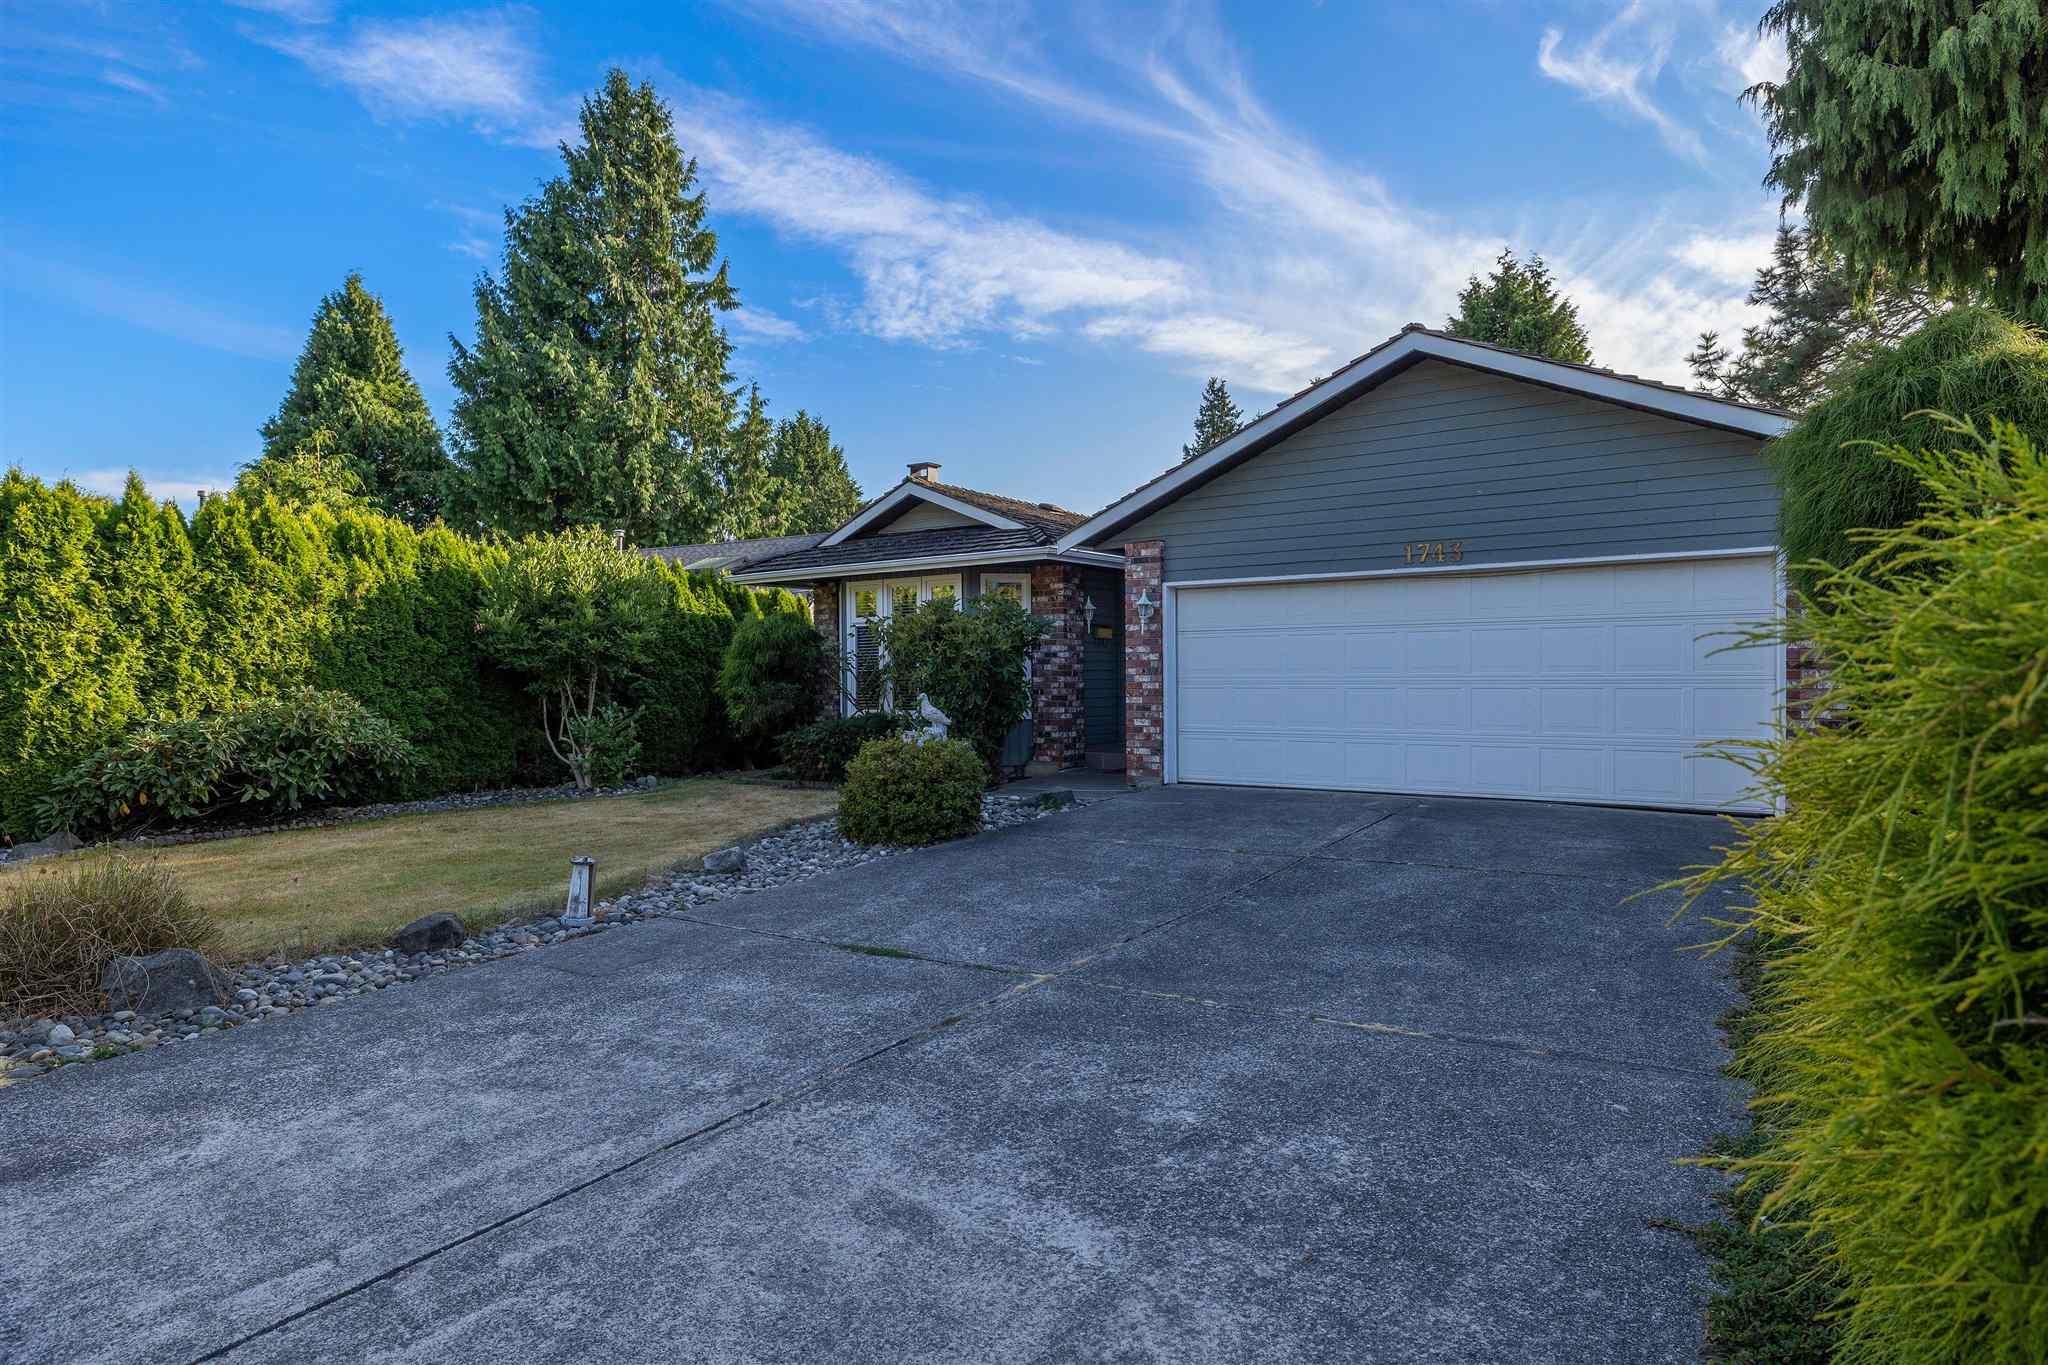 1743 148A STREET - Sunnyside Park Surrey House/Single Family for sale, 3 Bedrooms (R2604804) - #2